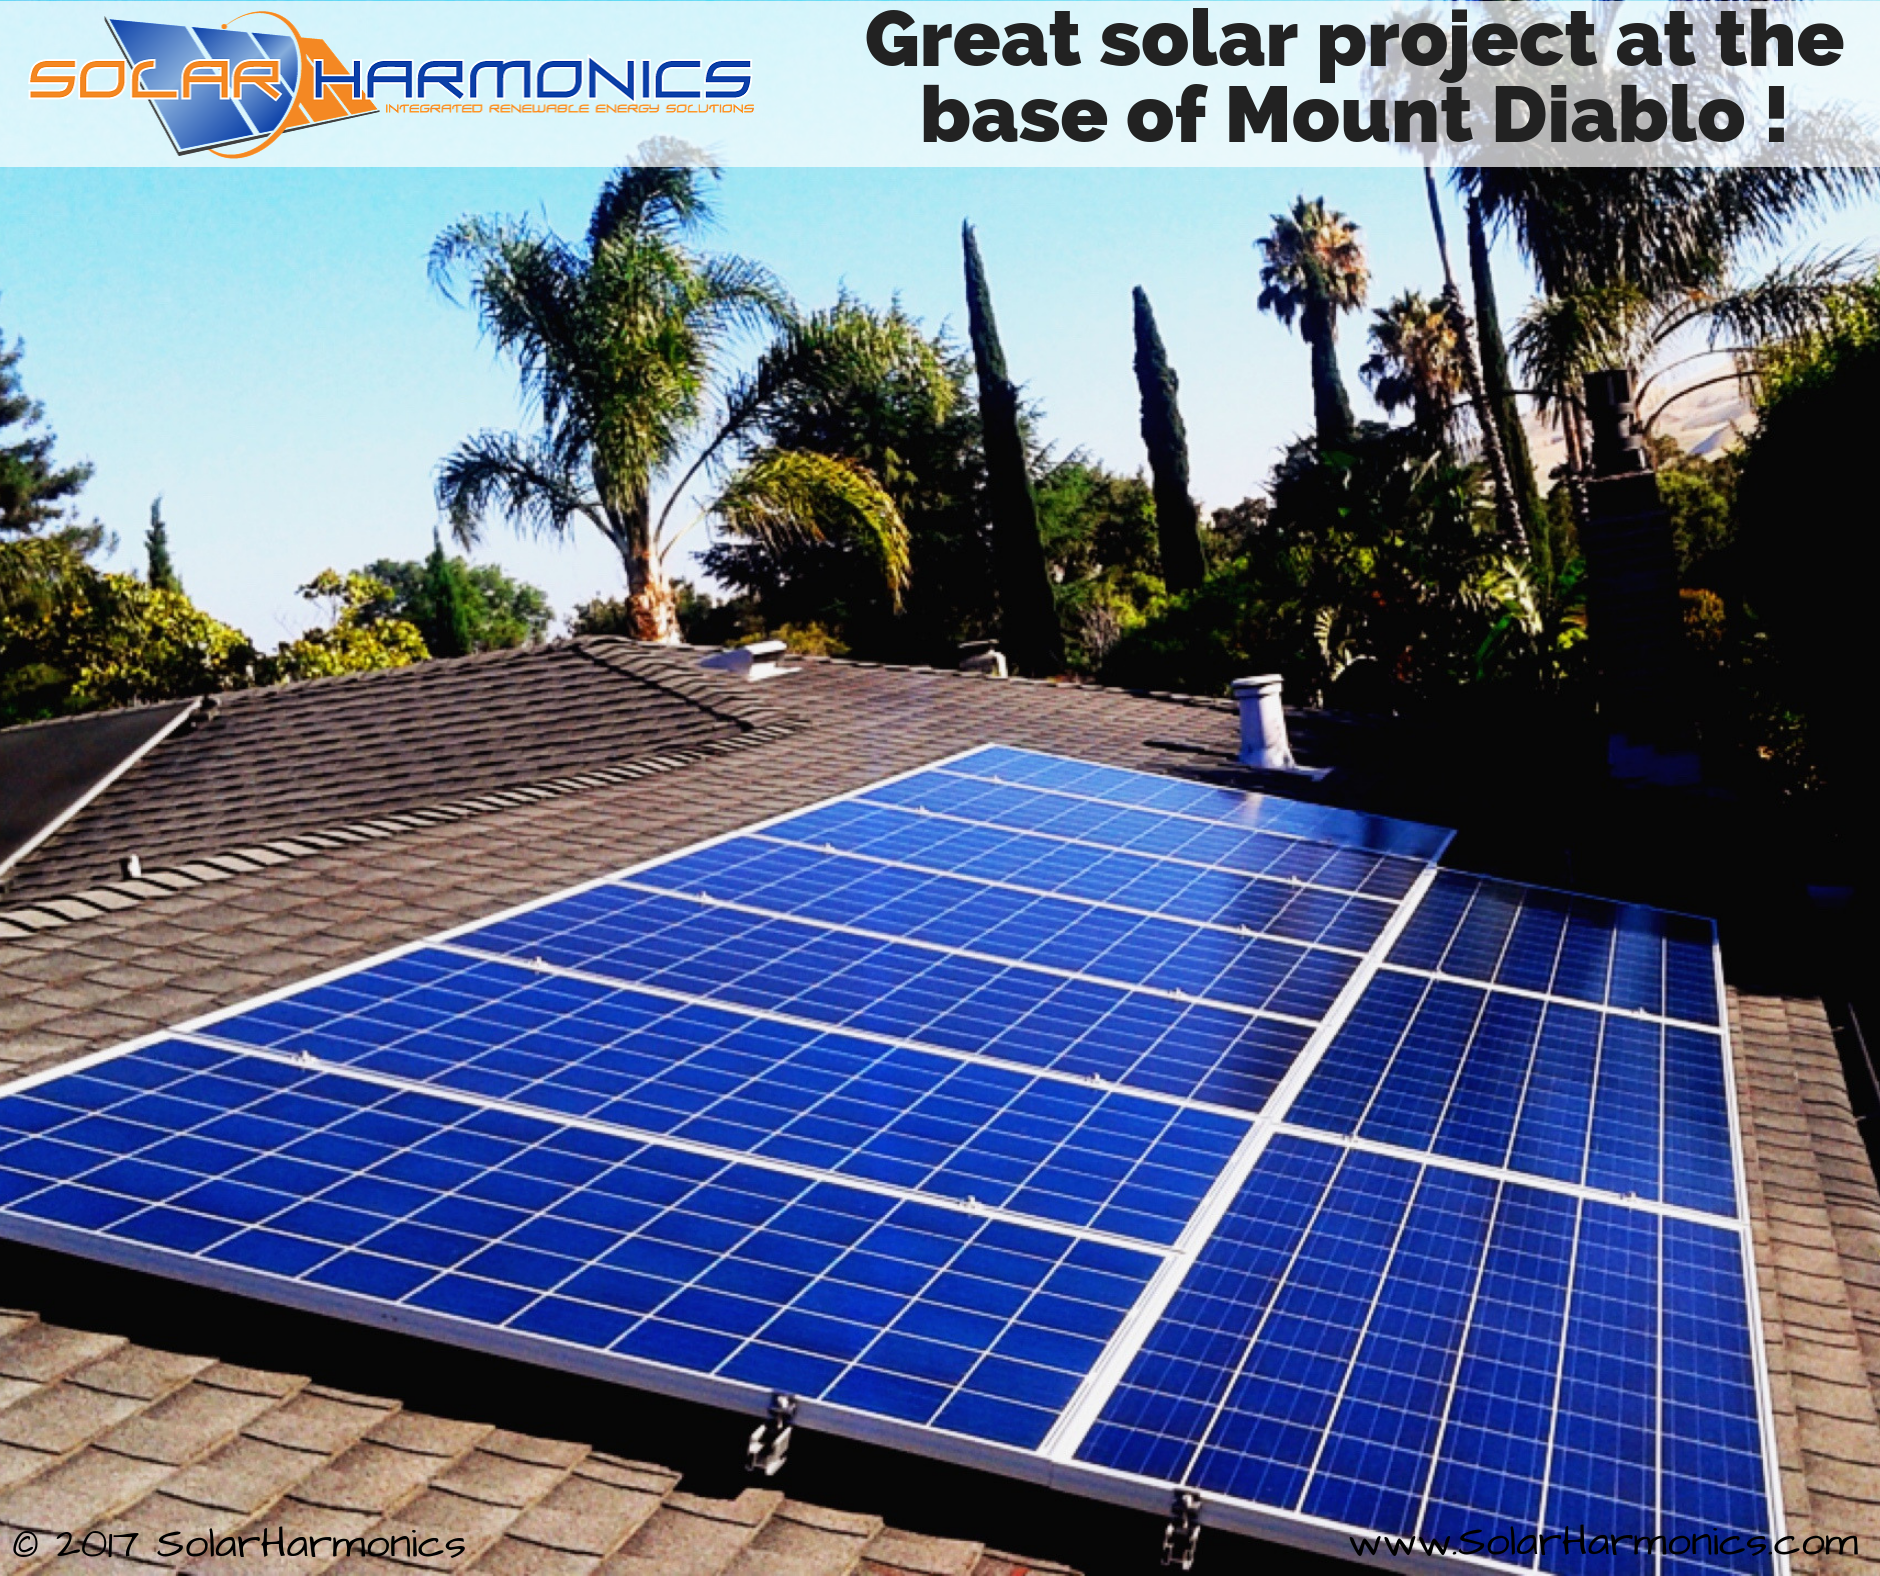 Solar_Harmonics_solar_installation_company_6001–6047-Heritage-Trail_Clayton_CA_United-States (1)